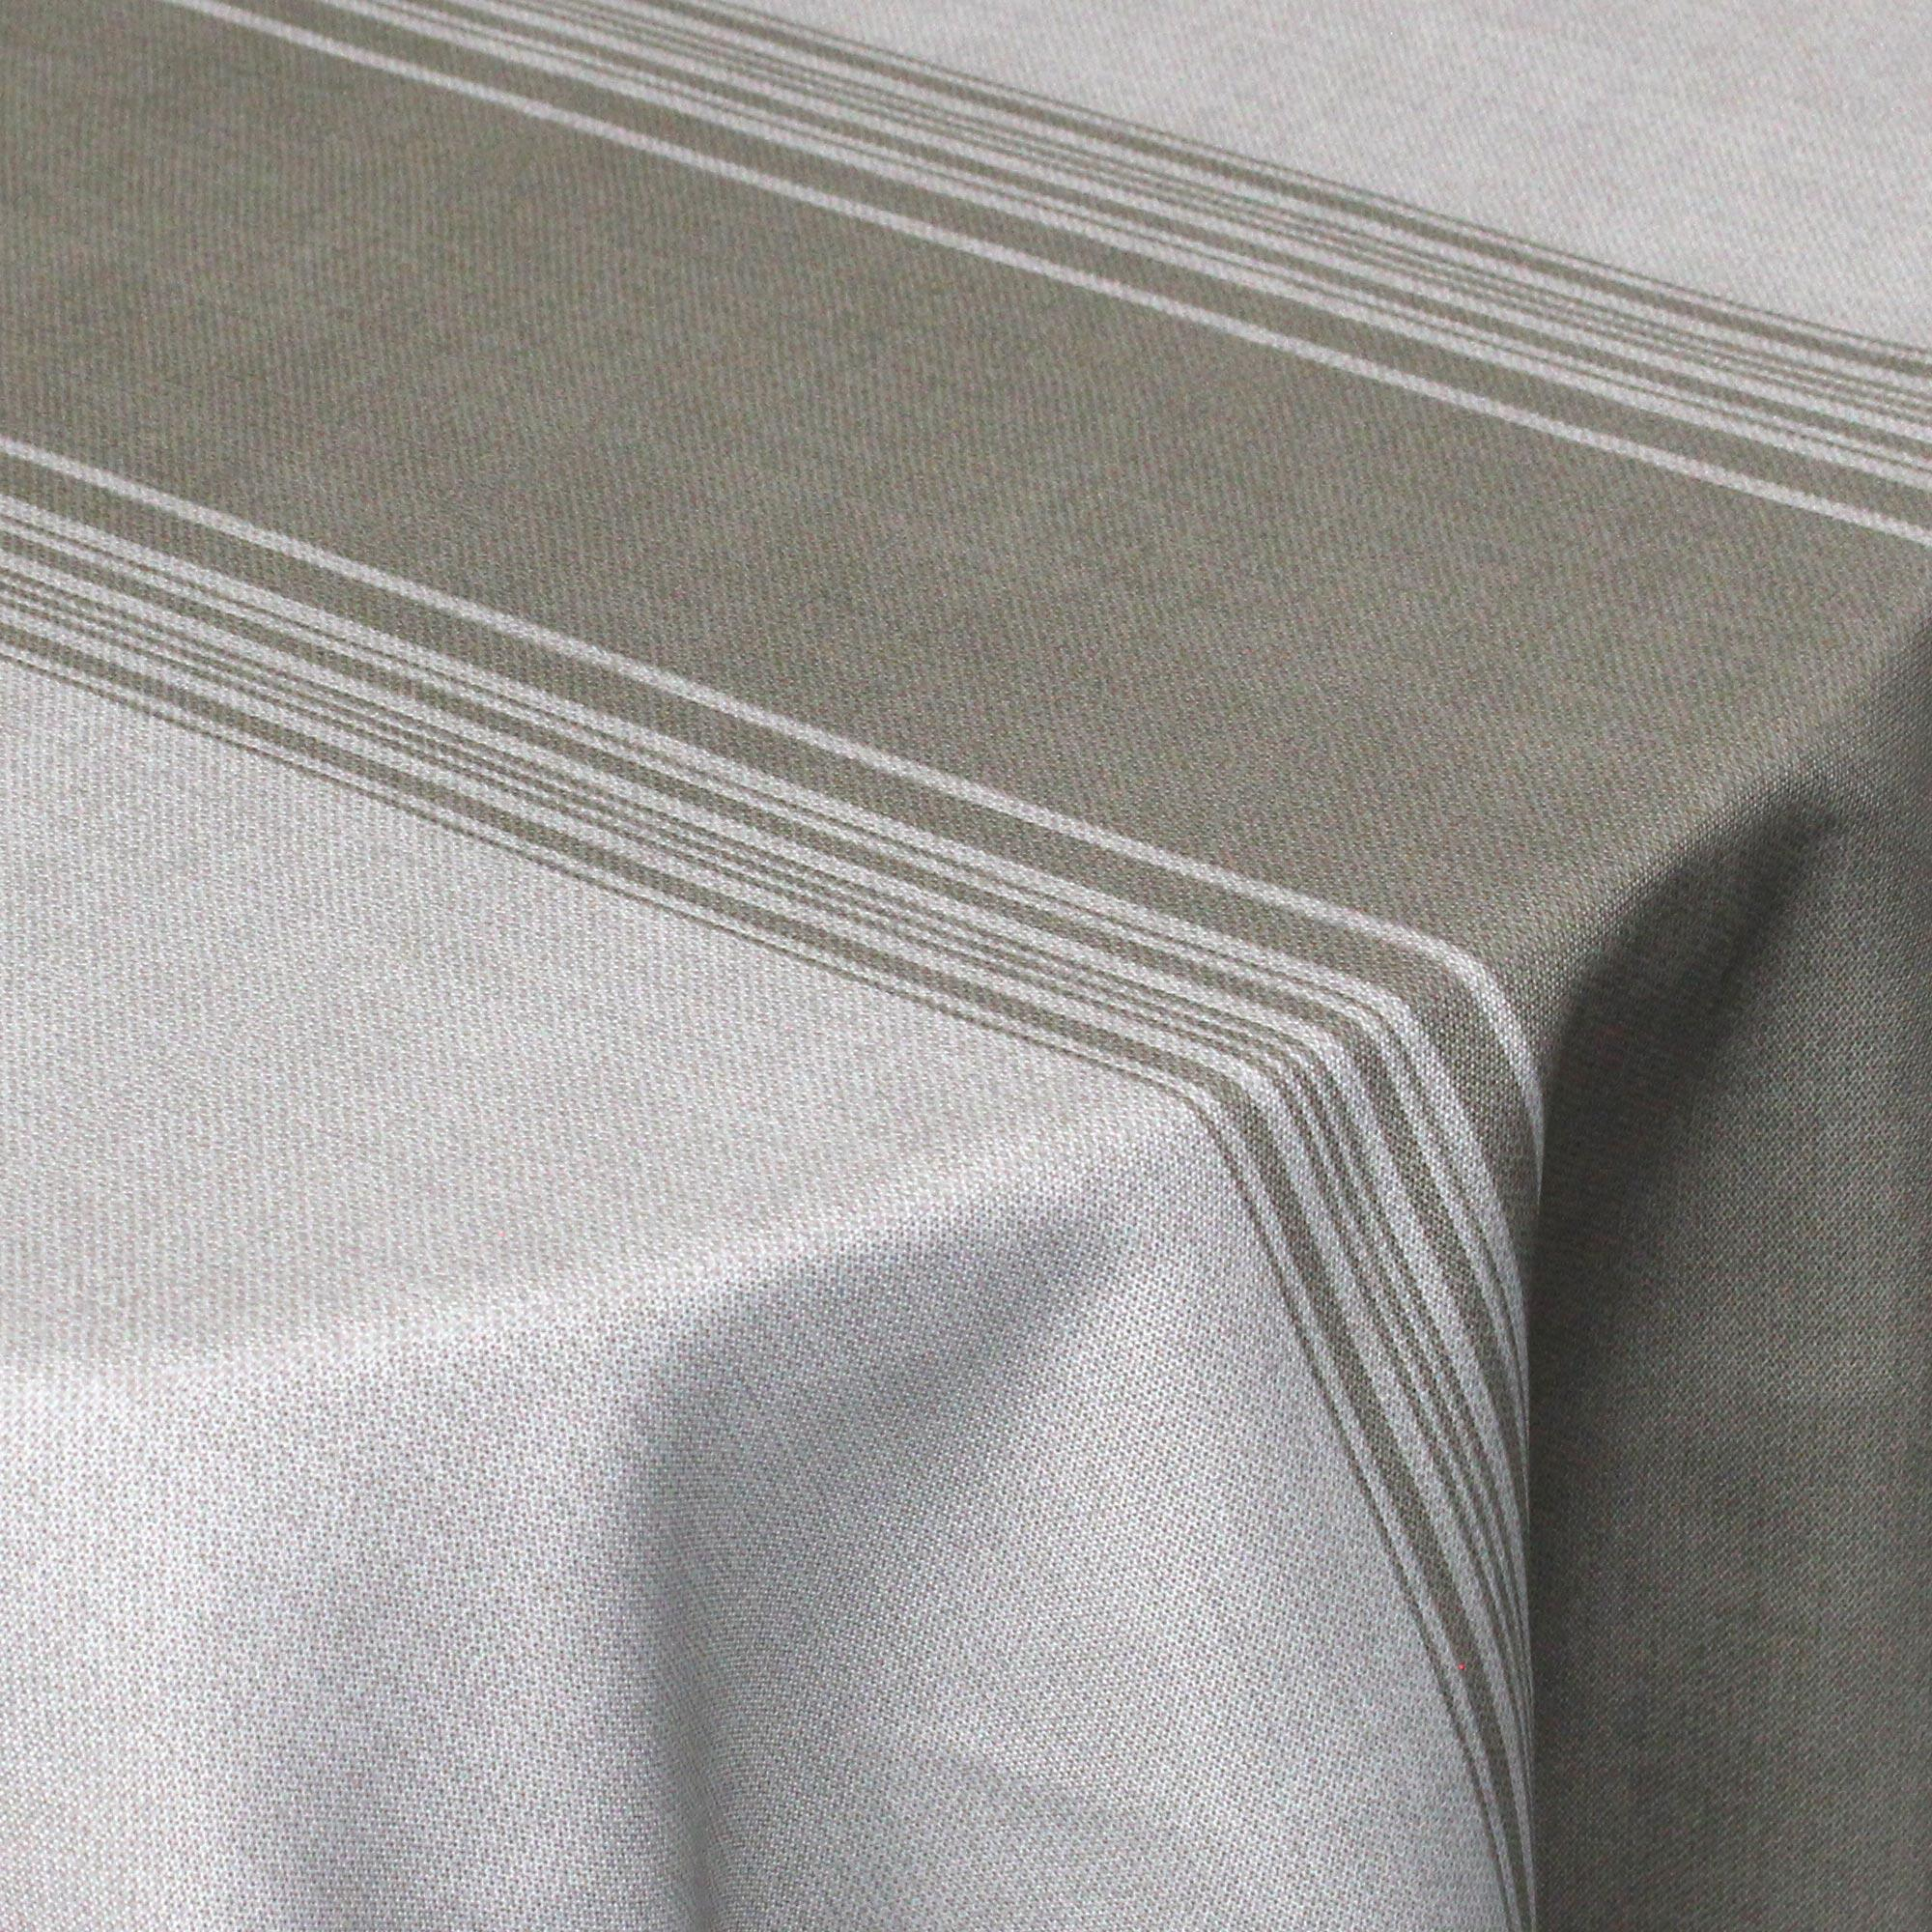 nappe ovale 180x240 cm imprim e 100 polyester bistrot taupe linnea linge de maison et. Black Bedroom Furniture Sets. Home Design Ideas